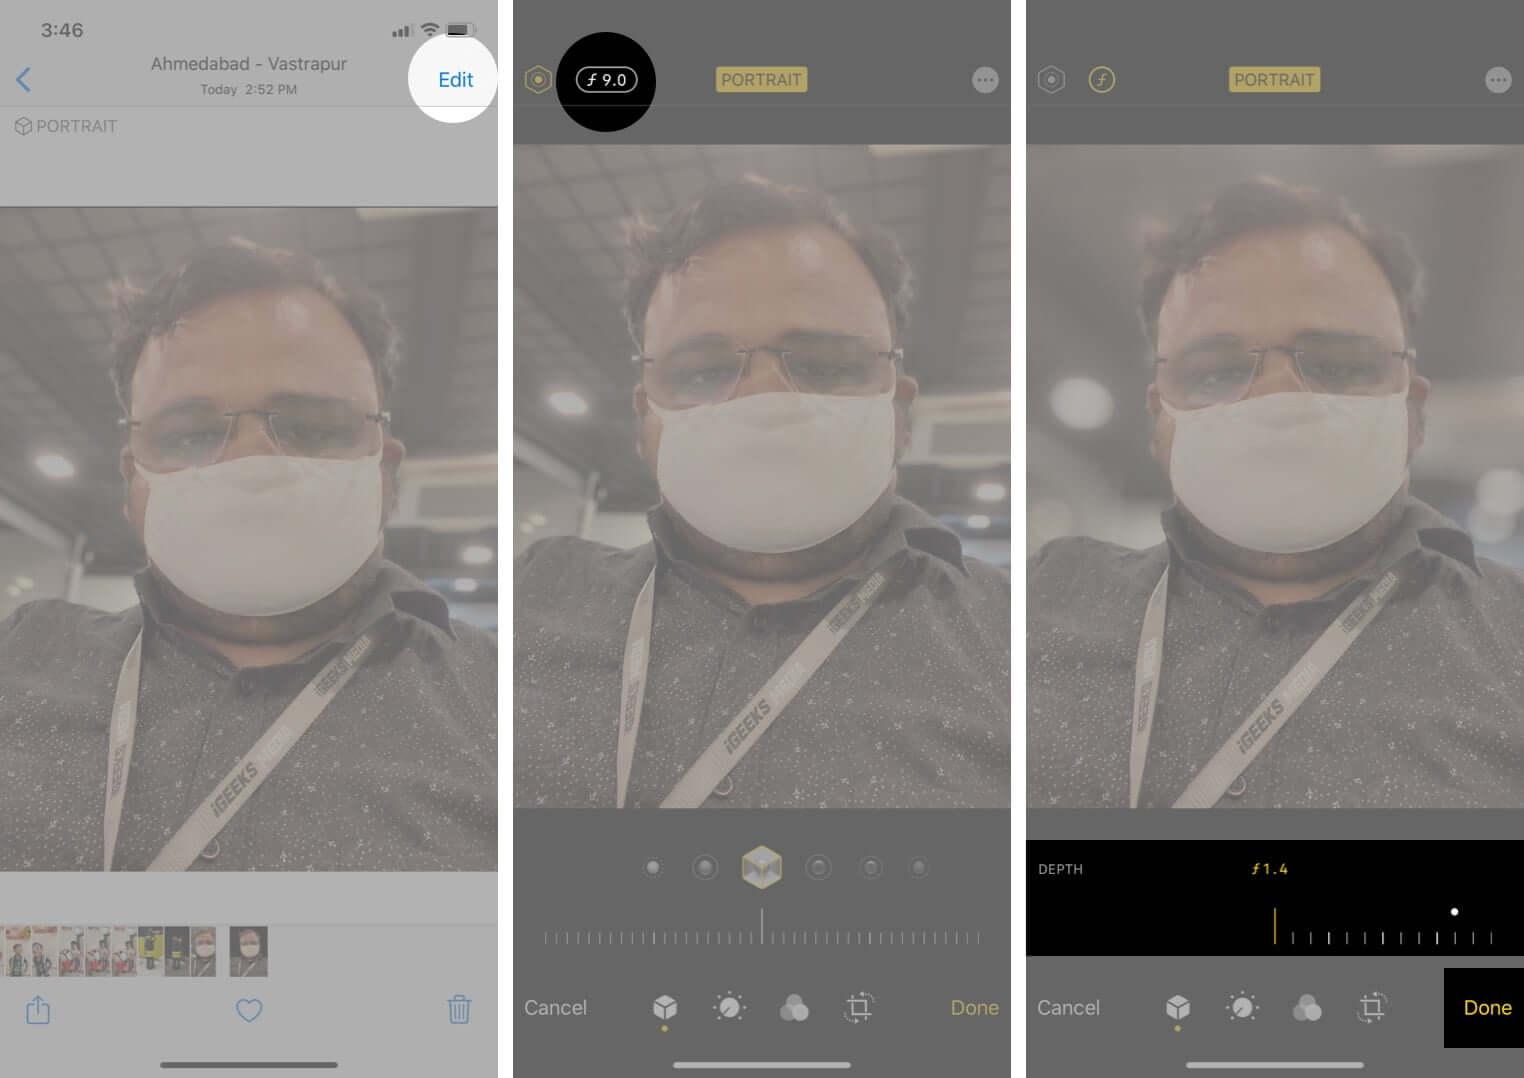 use depth control in portrait mode photo